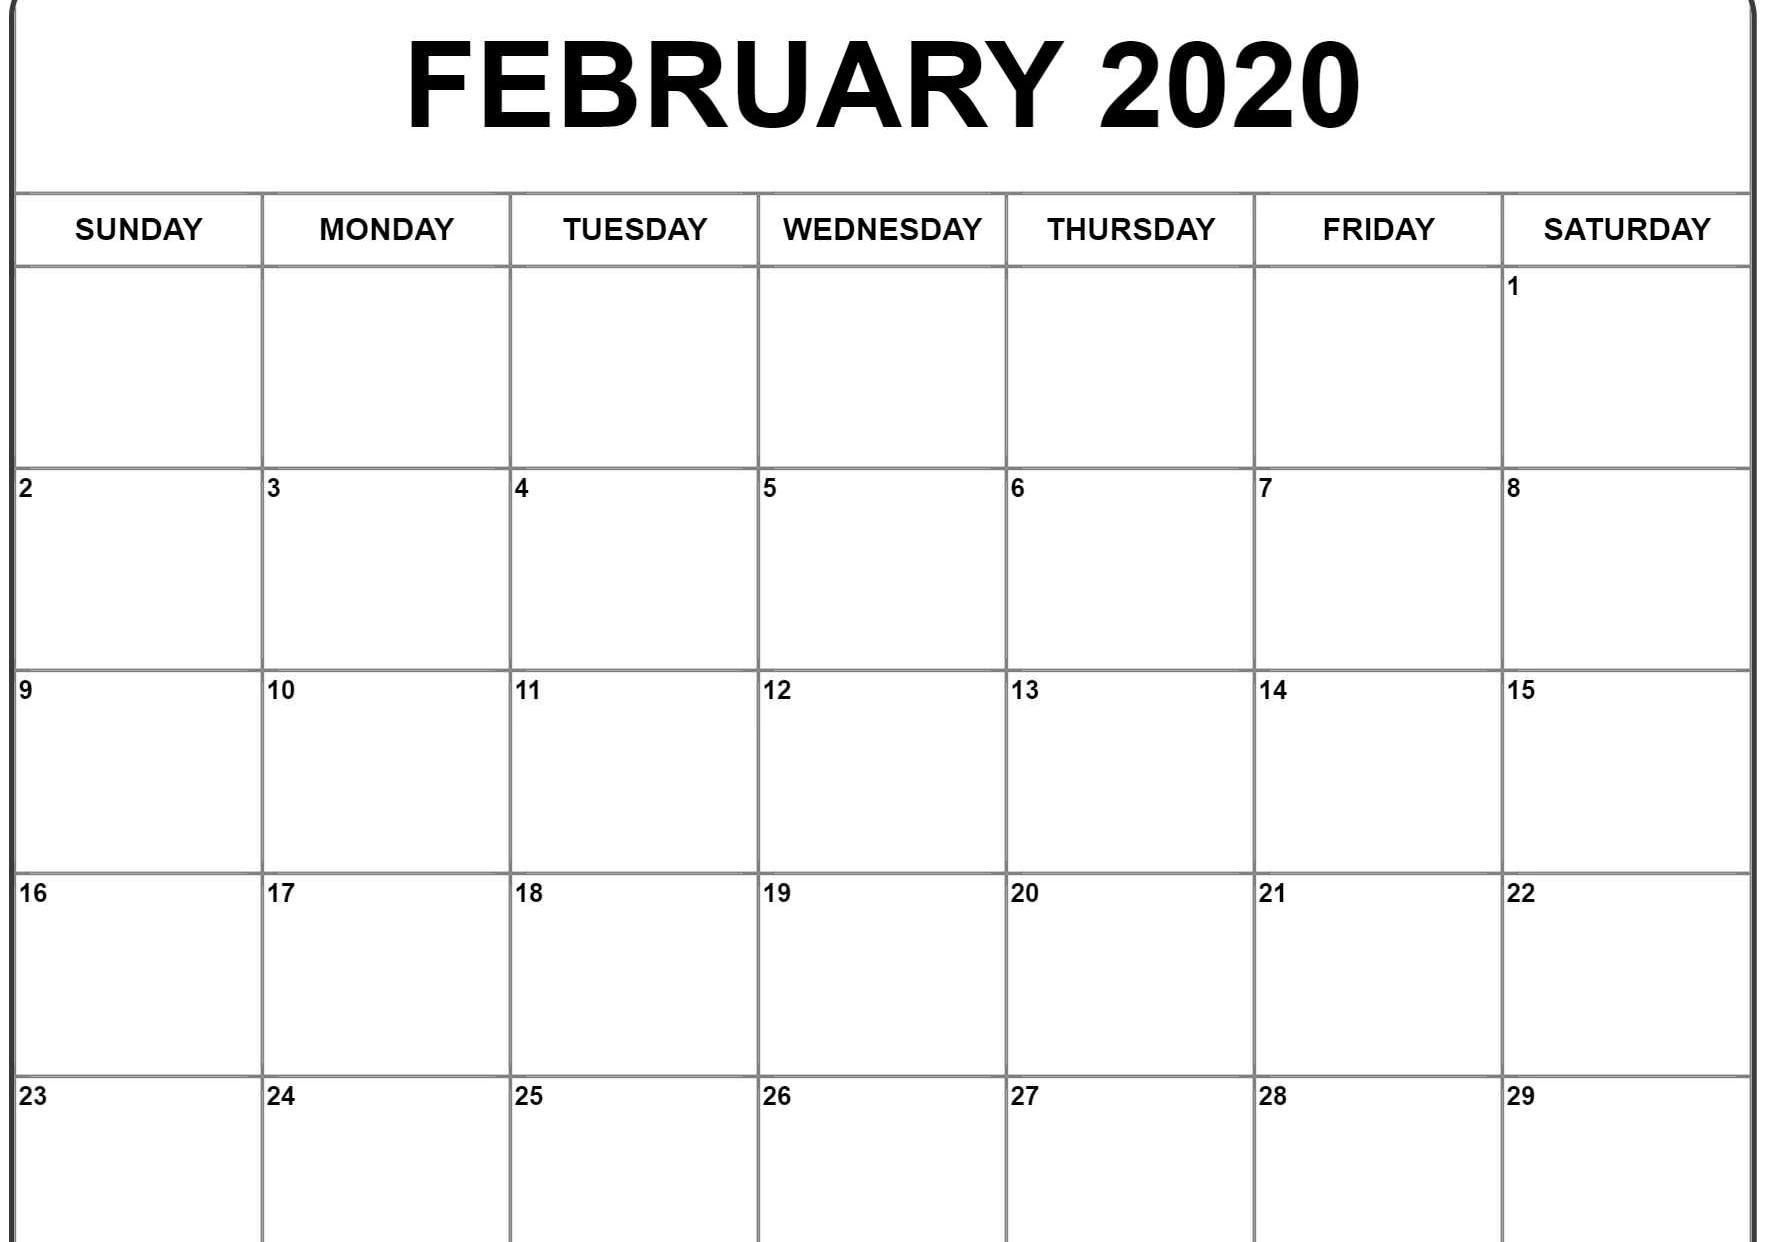 February 2020 Calendar Pdf, Word, Excel Printable Template  Feb 2020 Calendar